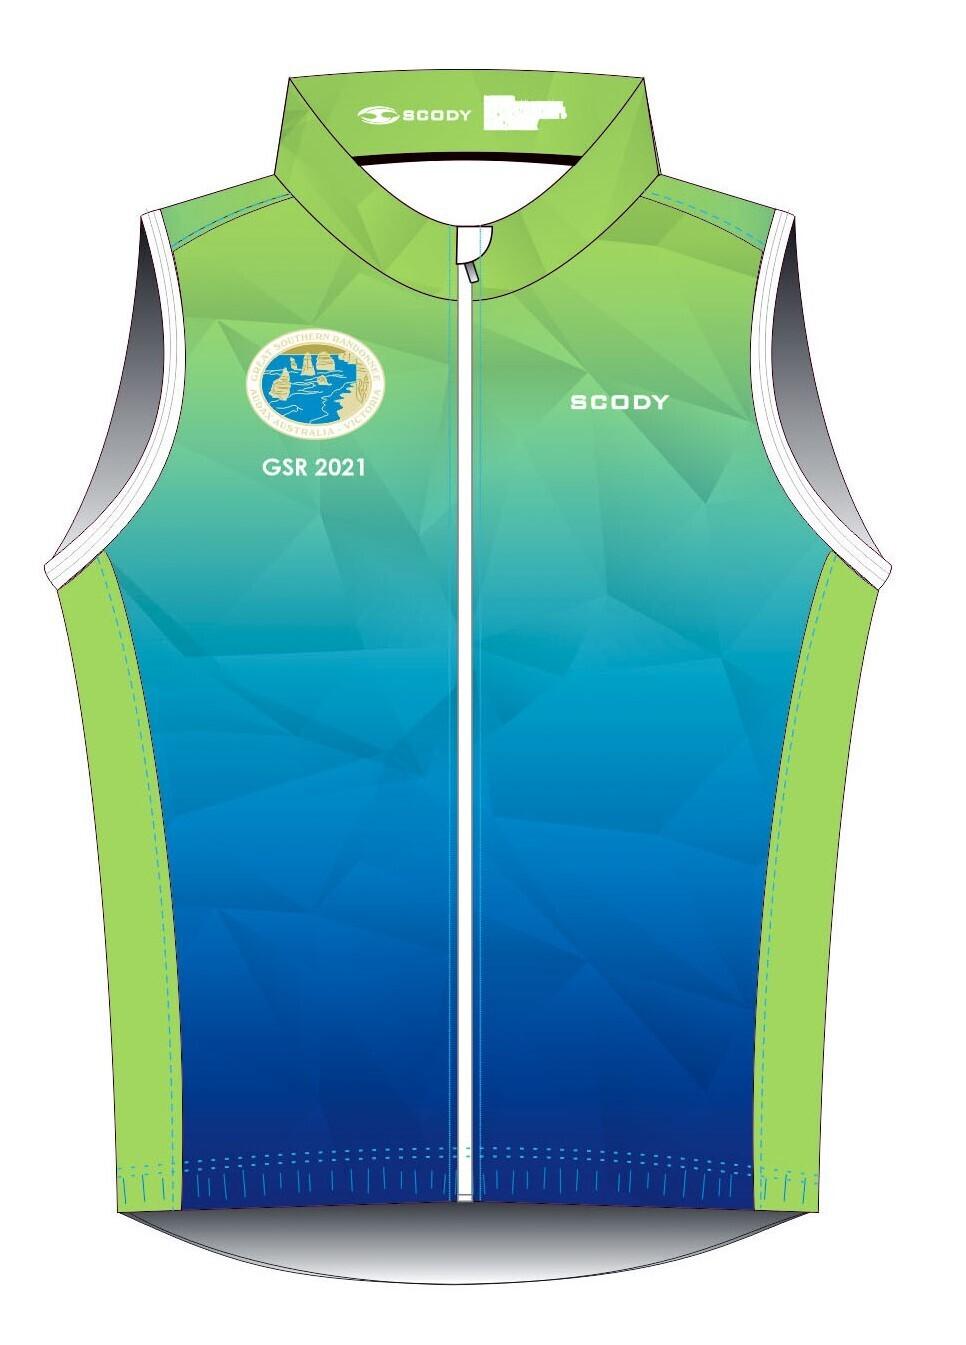 GSR 2021 Lightweight Wind Vest with Mesh Back